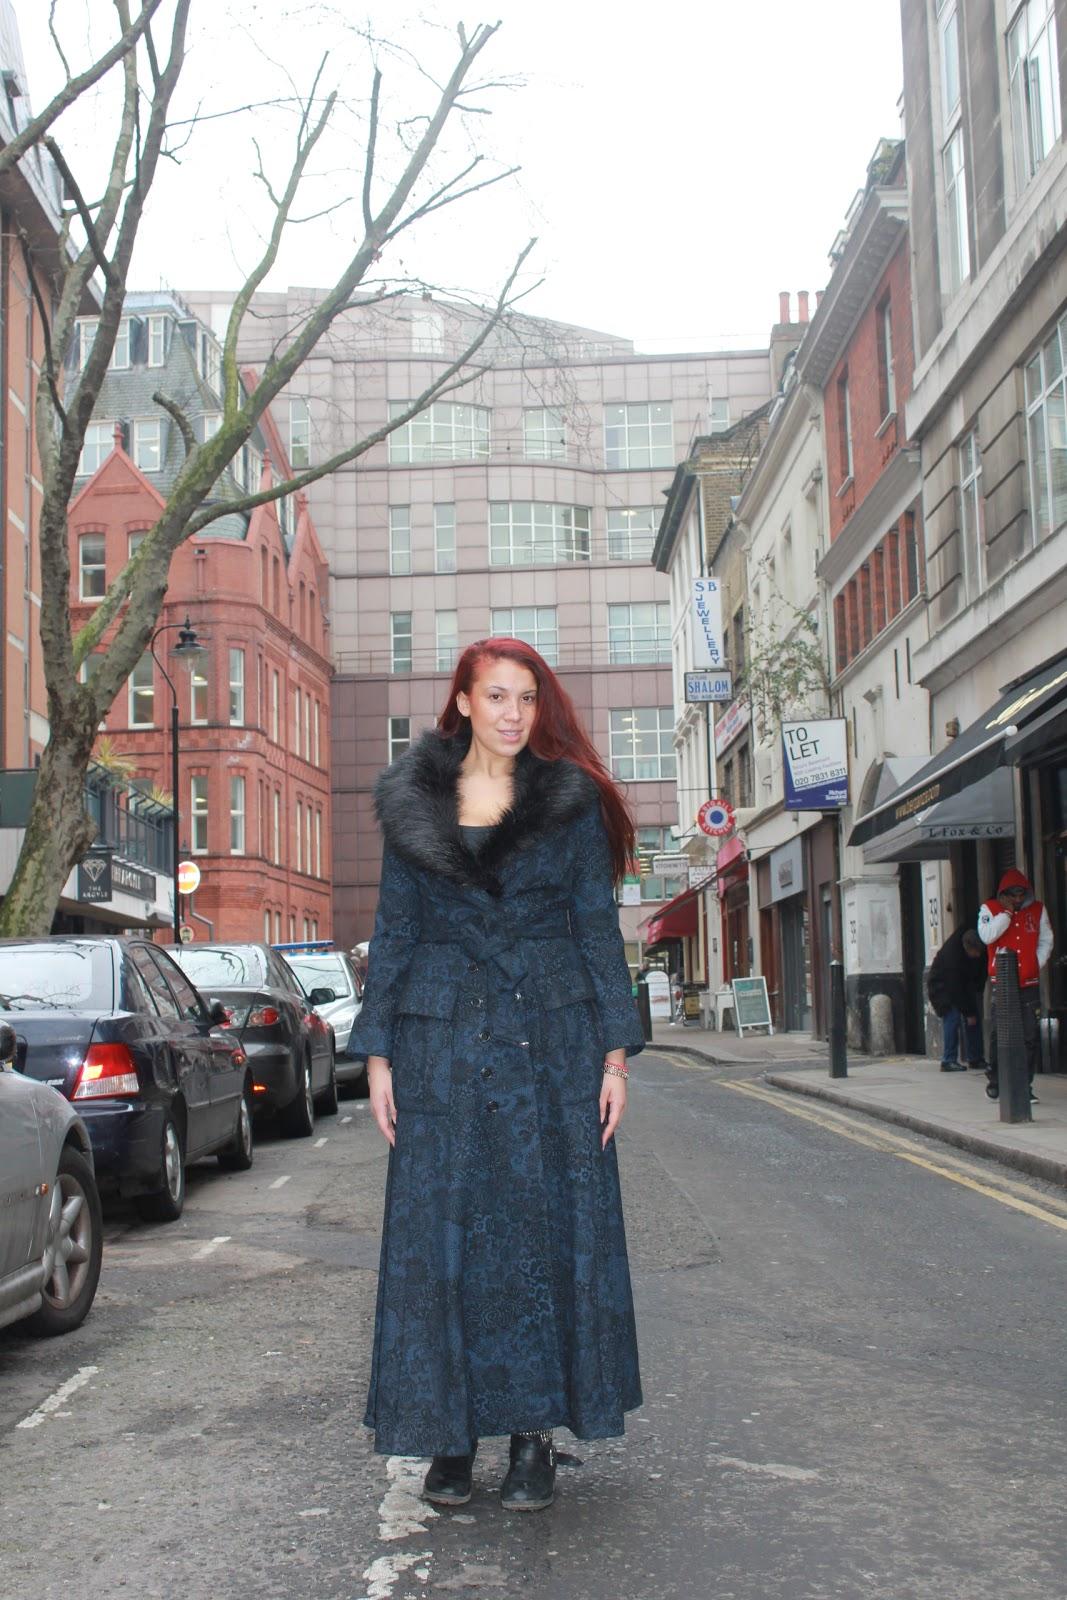 The Perfect Winter Coat by Hemyca